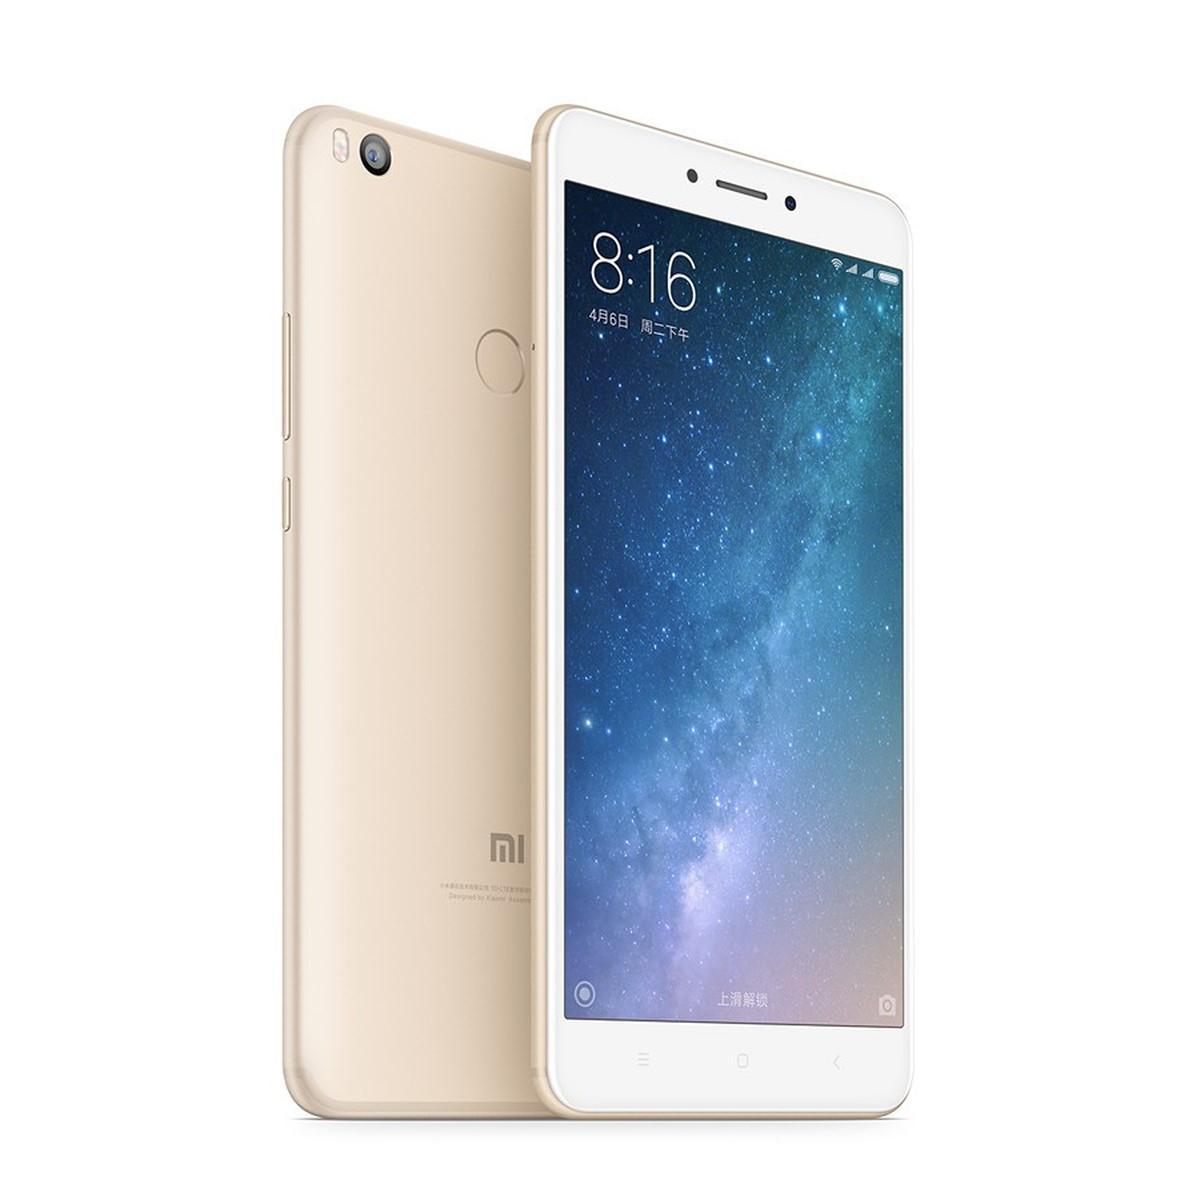 56e33544282 Xiaomi Mi Max 2 quick review  Digital Photography Review